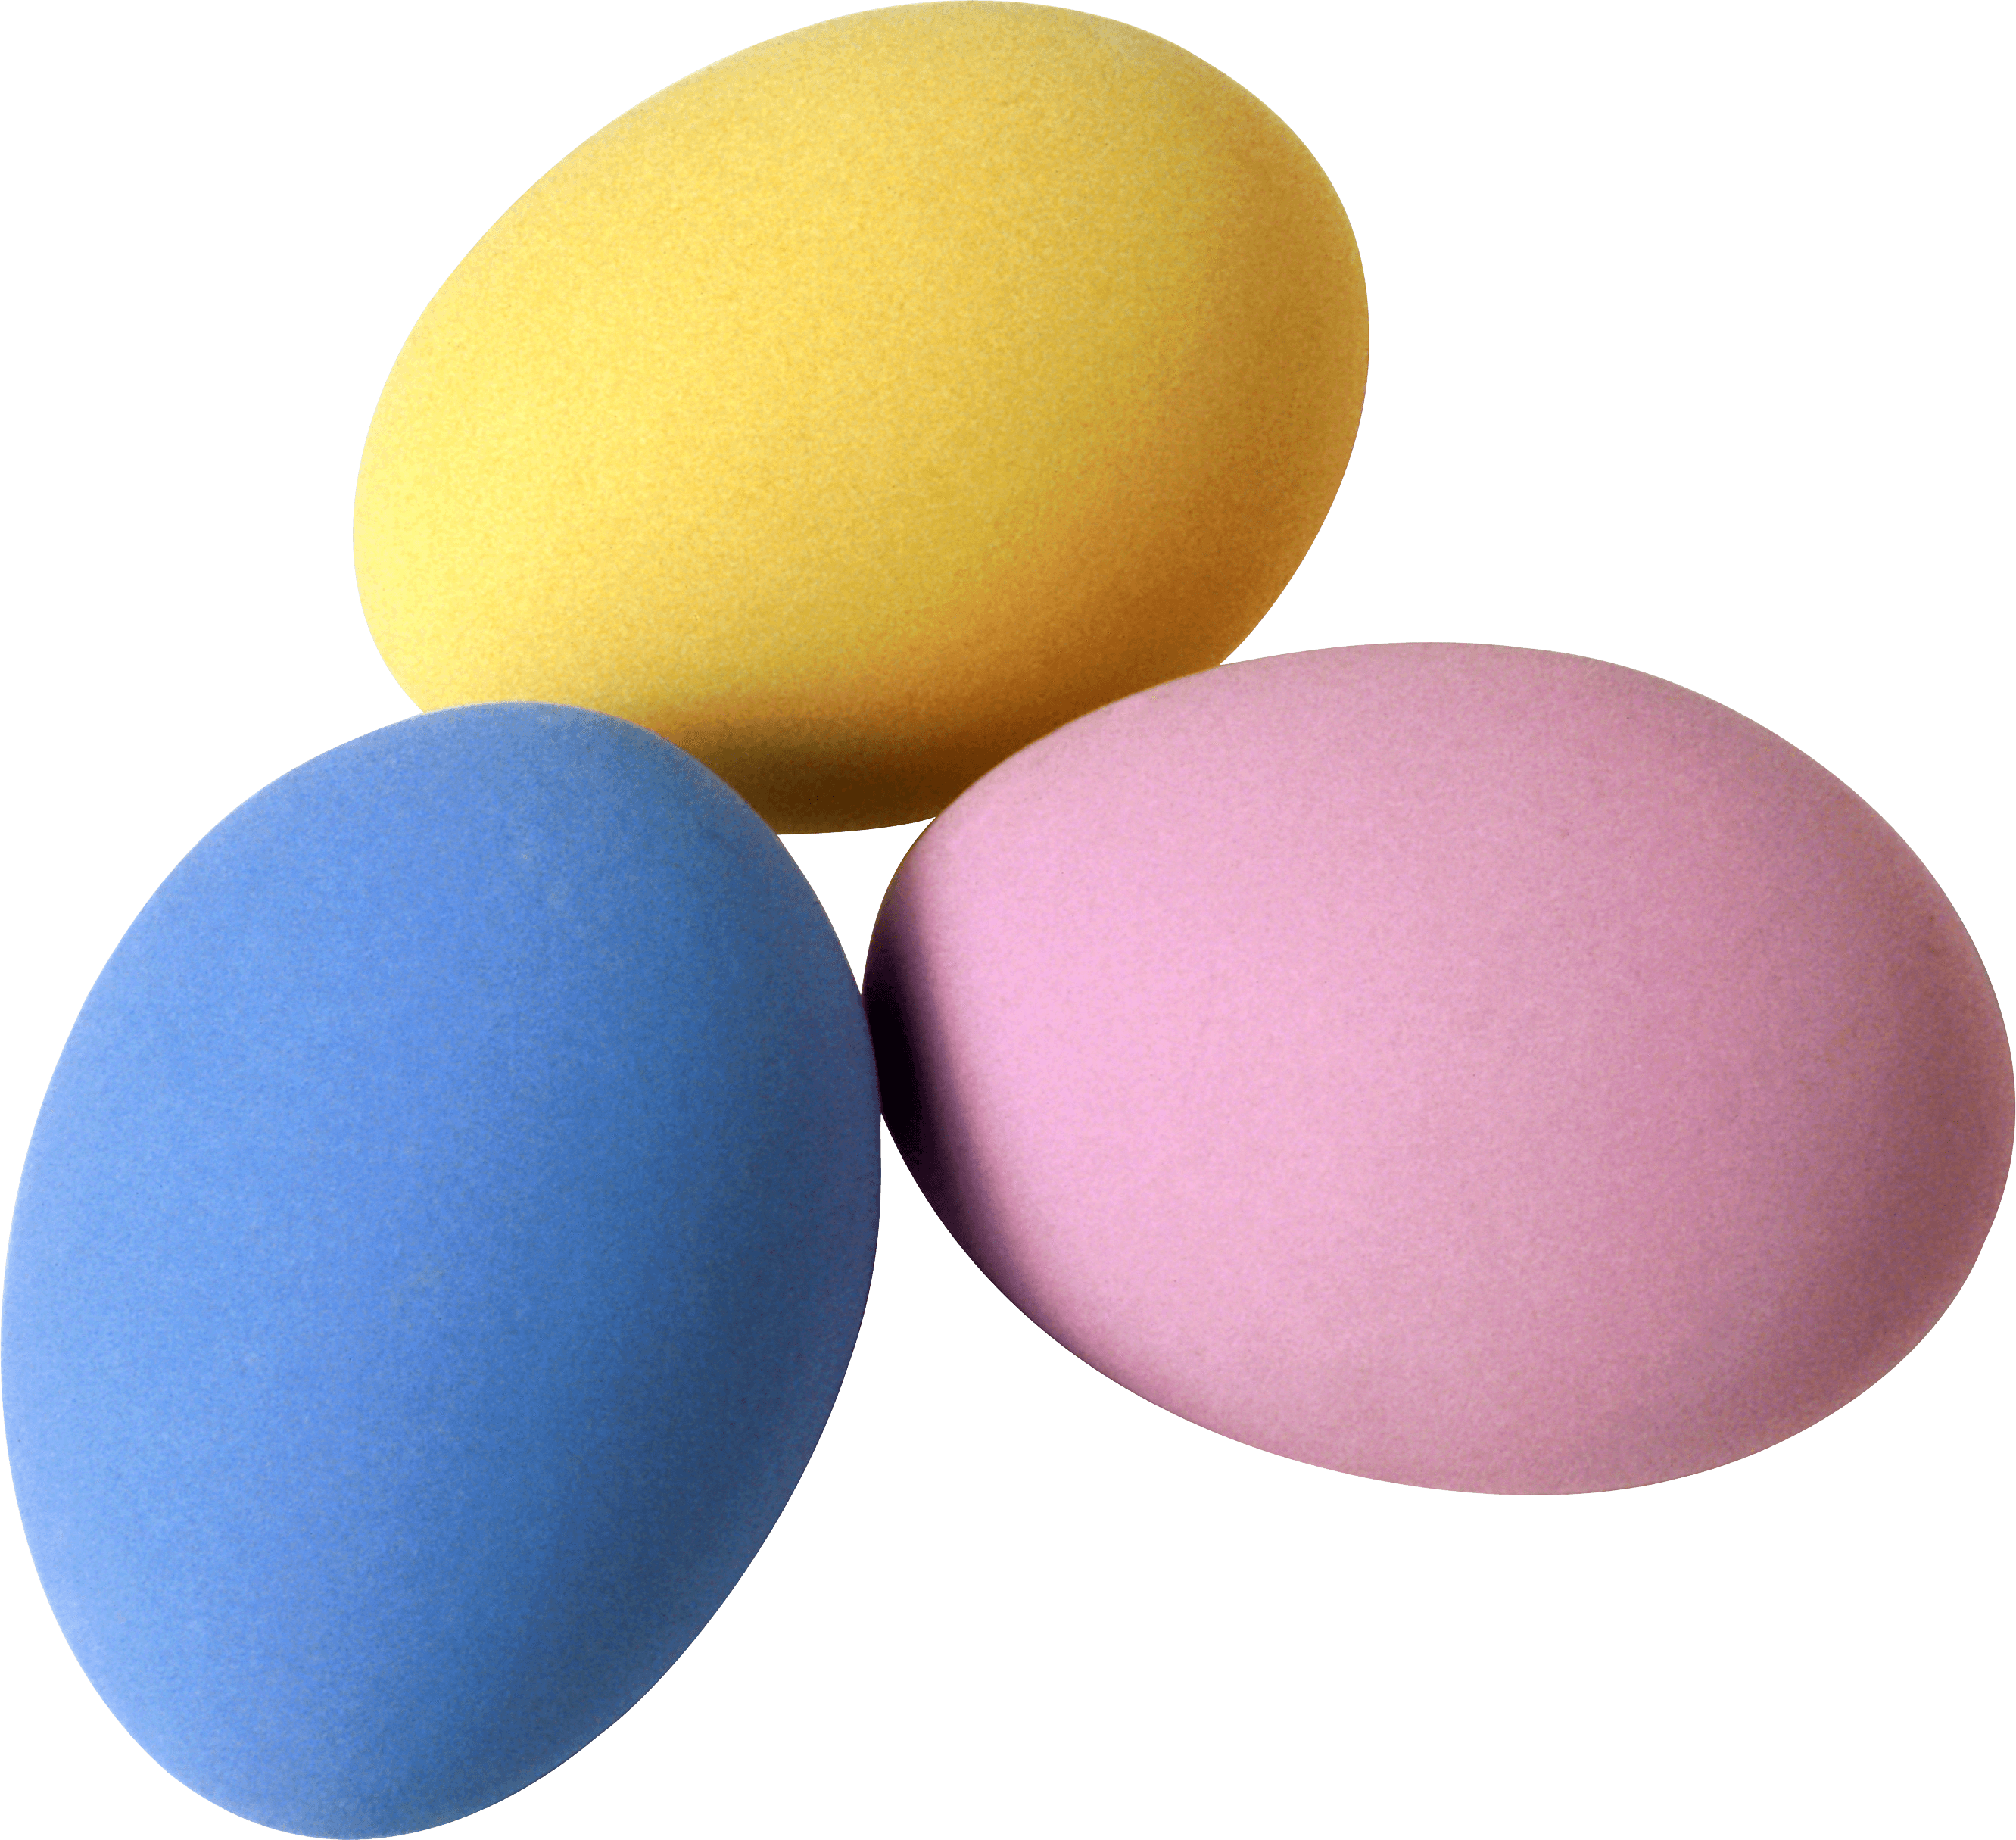 Download Colorful Eggs Png Image HQ PNG Image | FreePNGImg